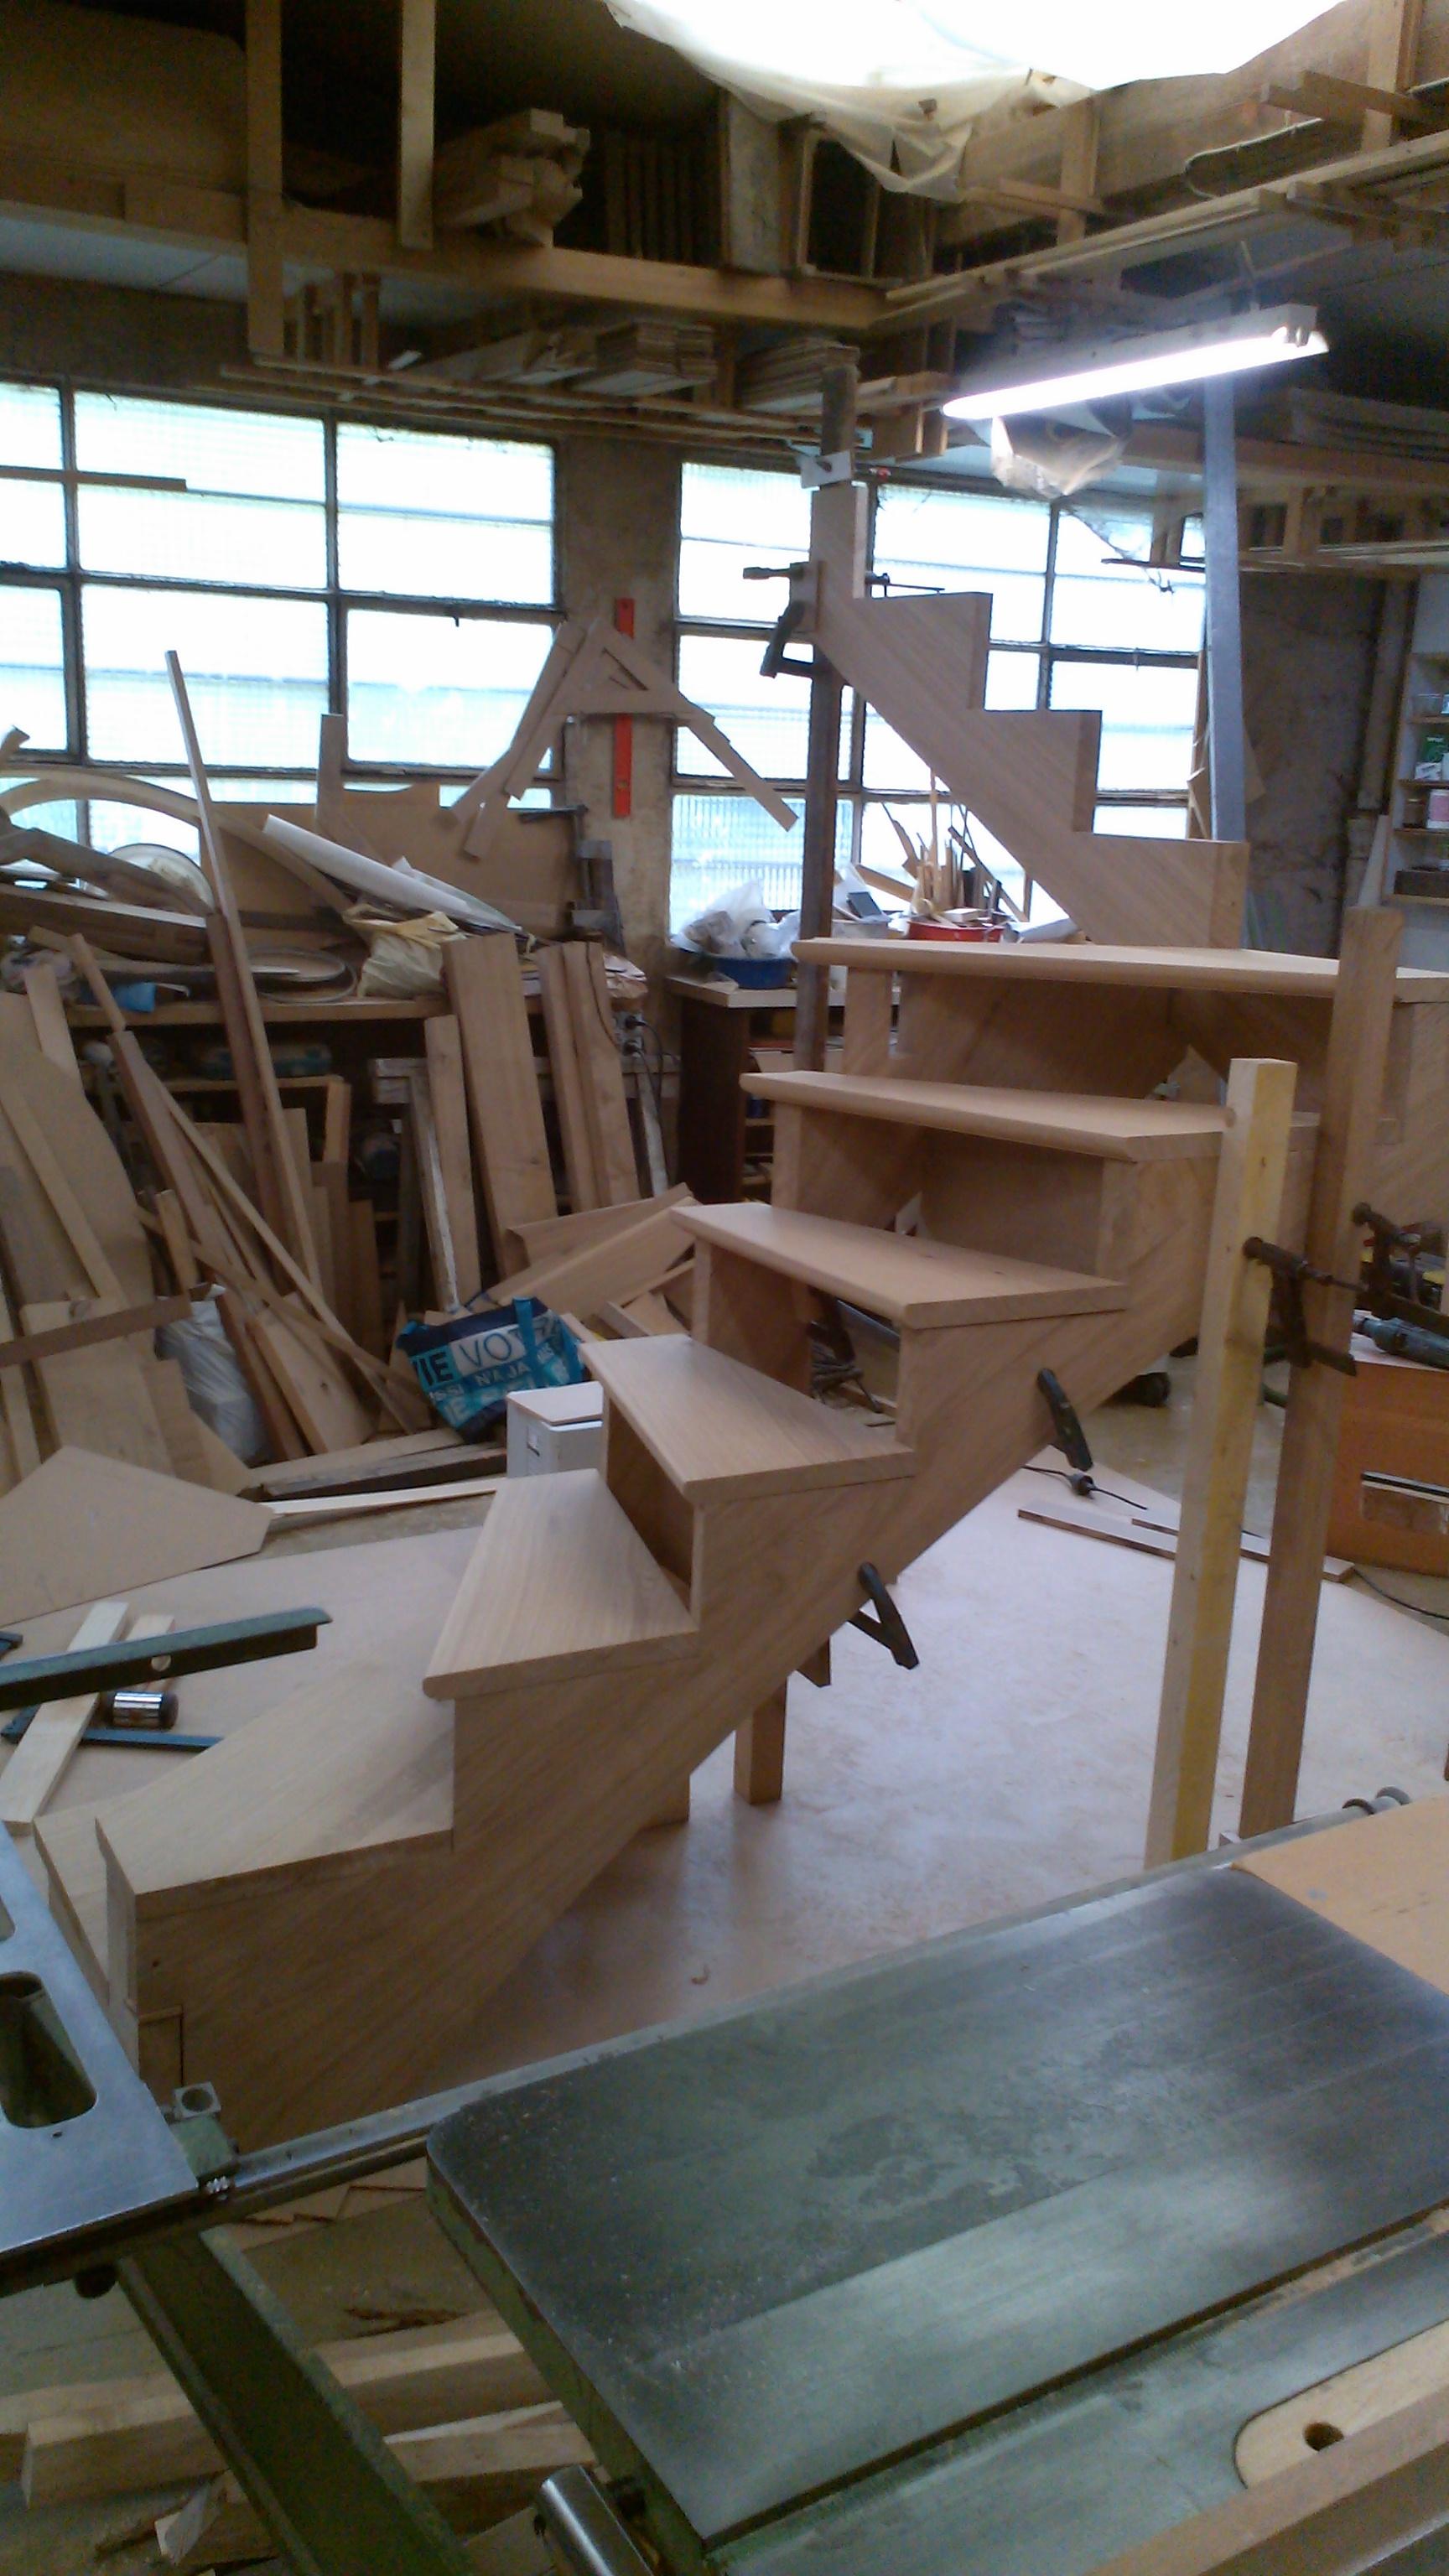 escalier 3 4 tournant juillet 2014 menuiserie. Black Bedroom Furniture Sets. Home Design Ideas